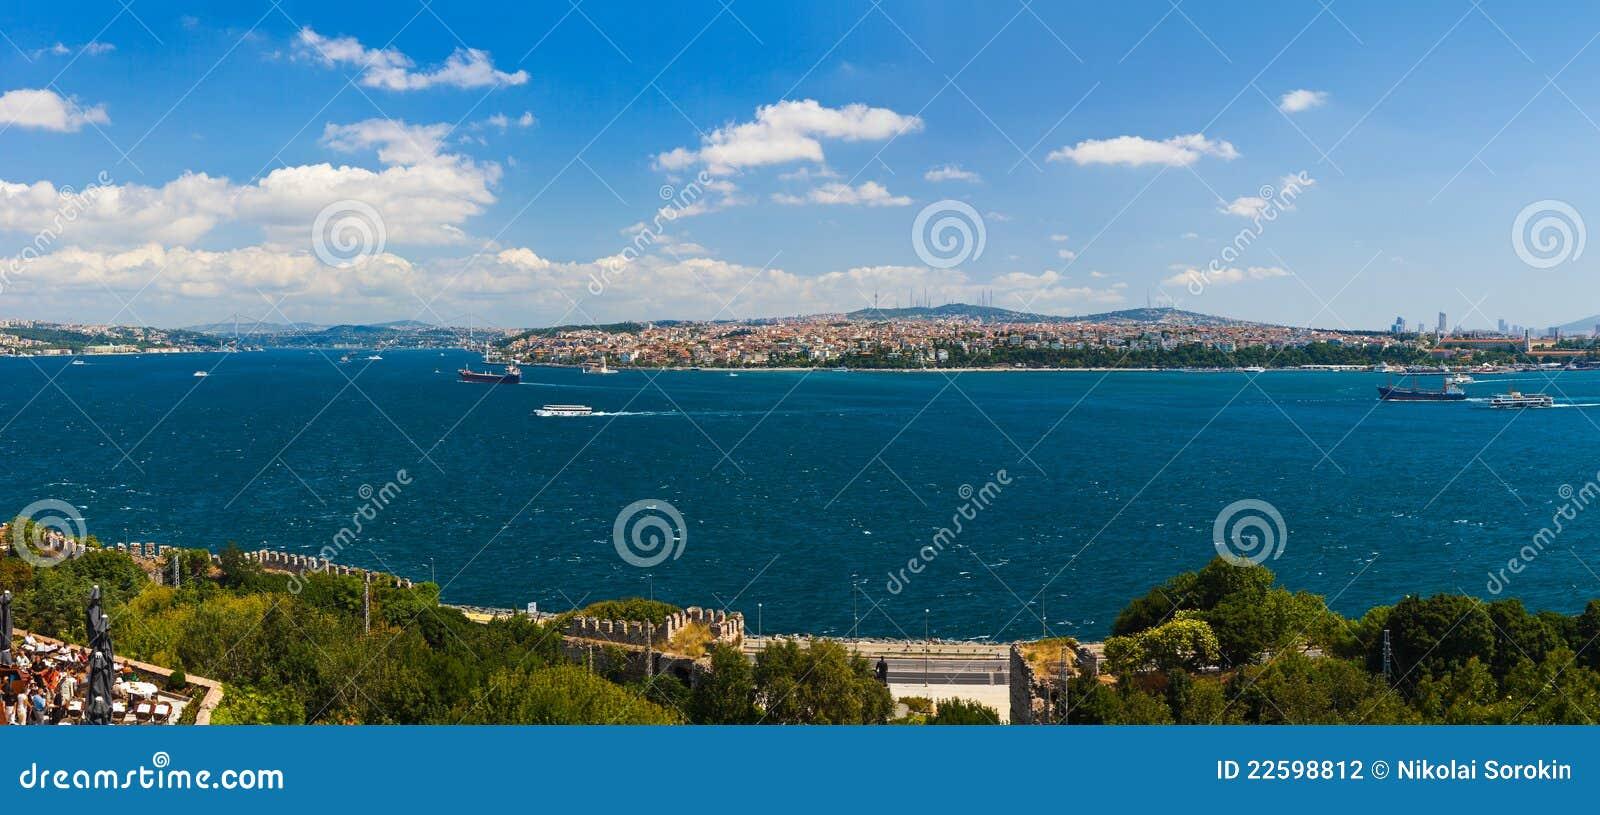 travel sea wallpaper panorama - photo #46